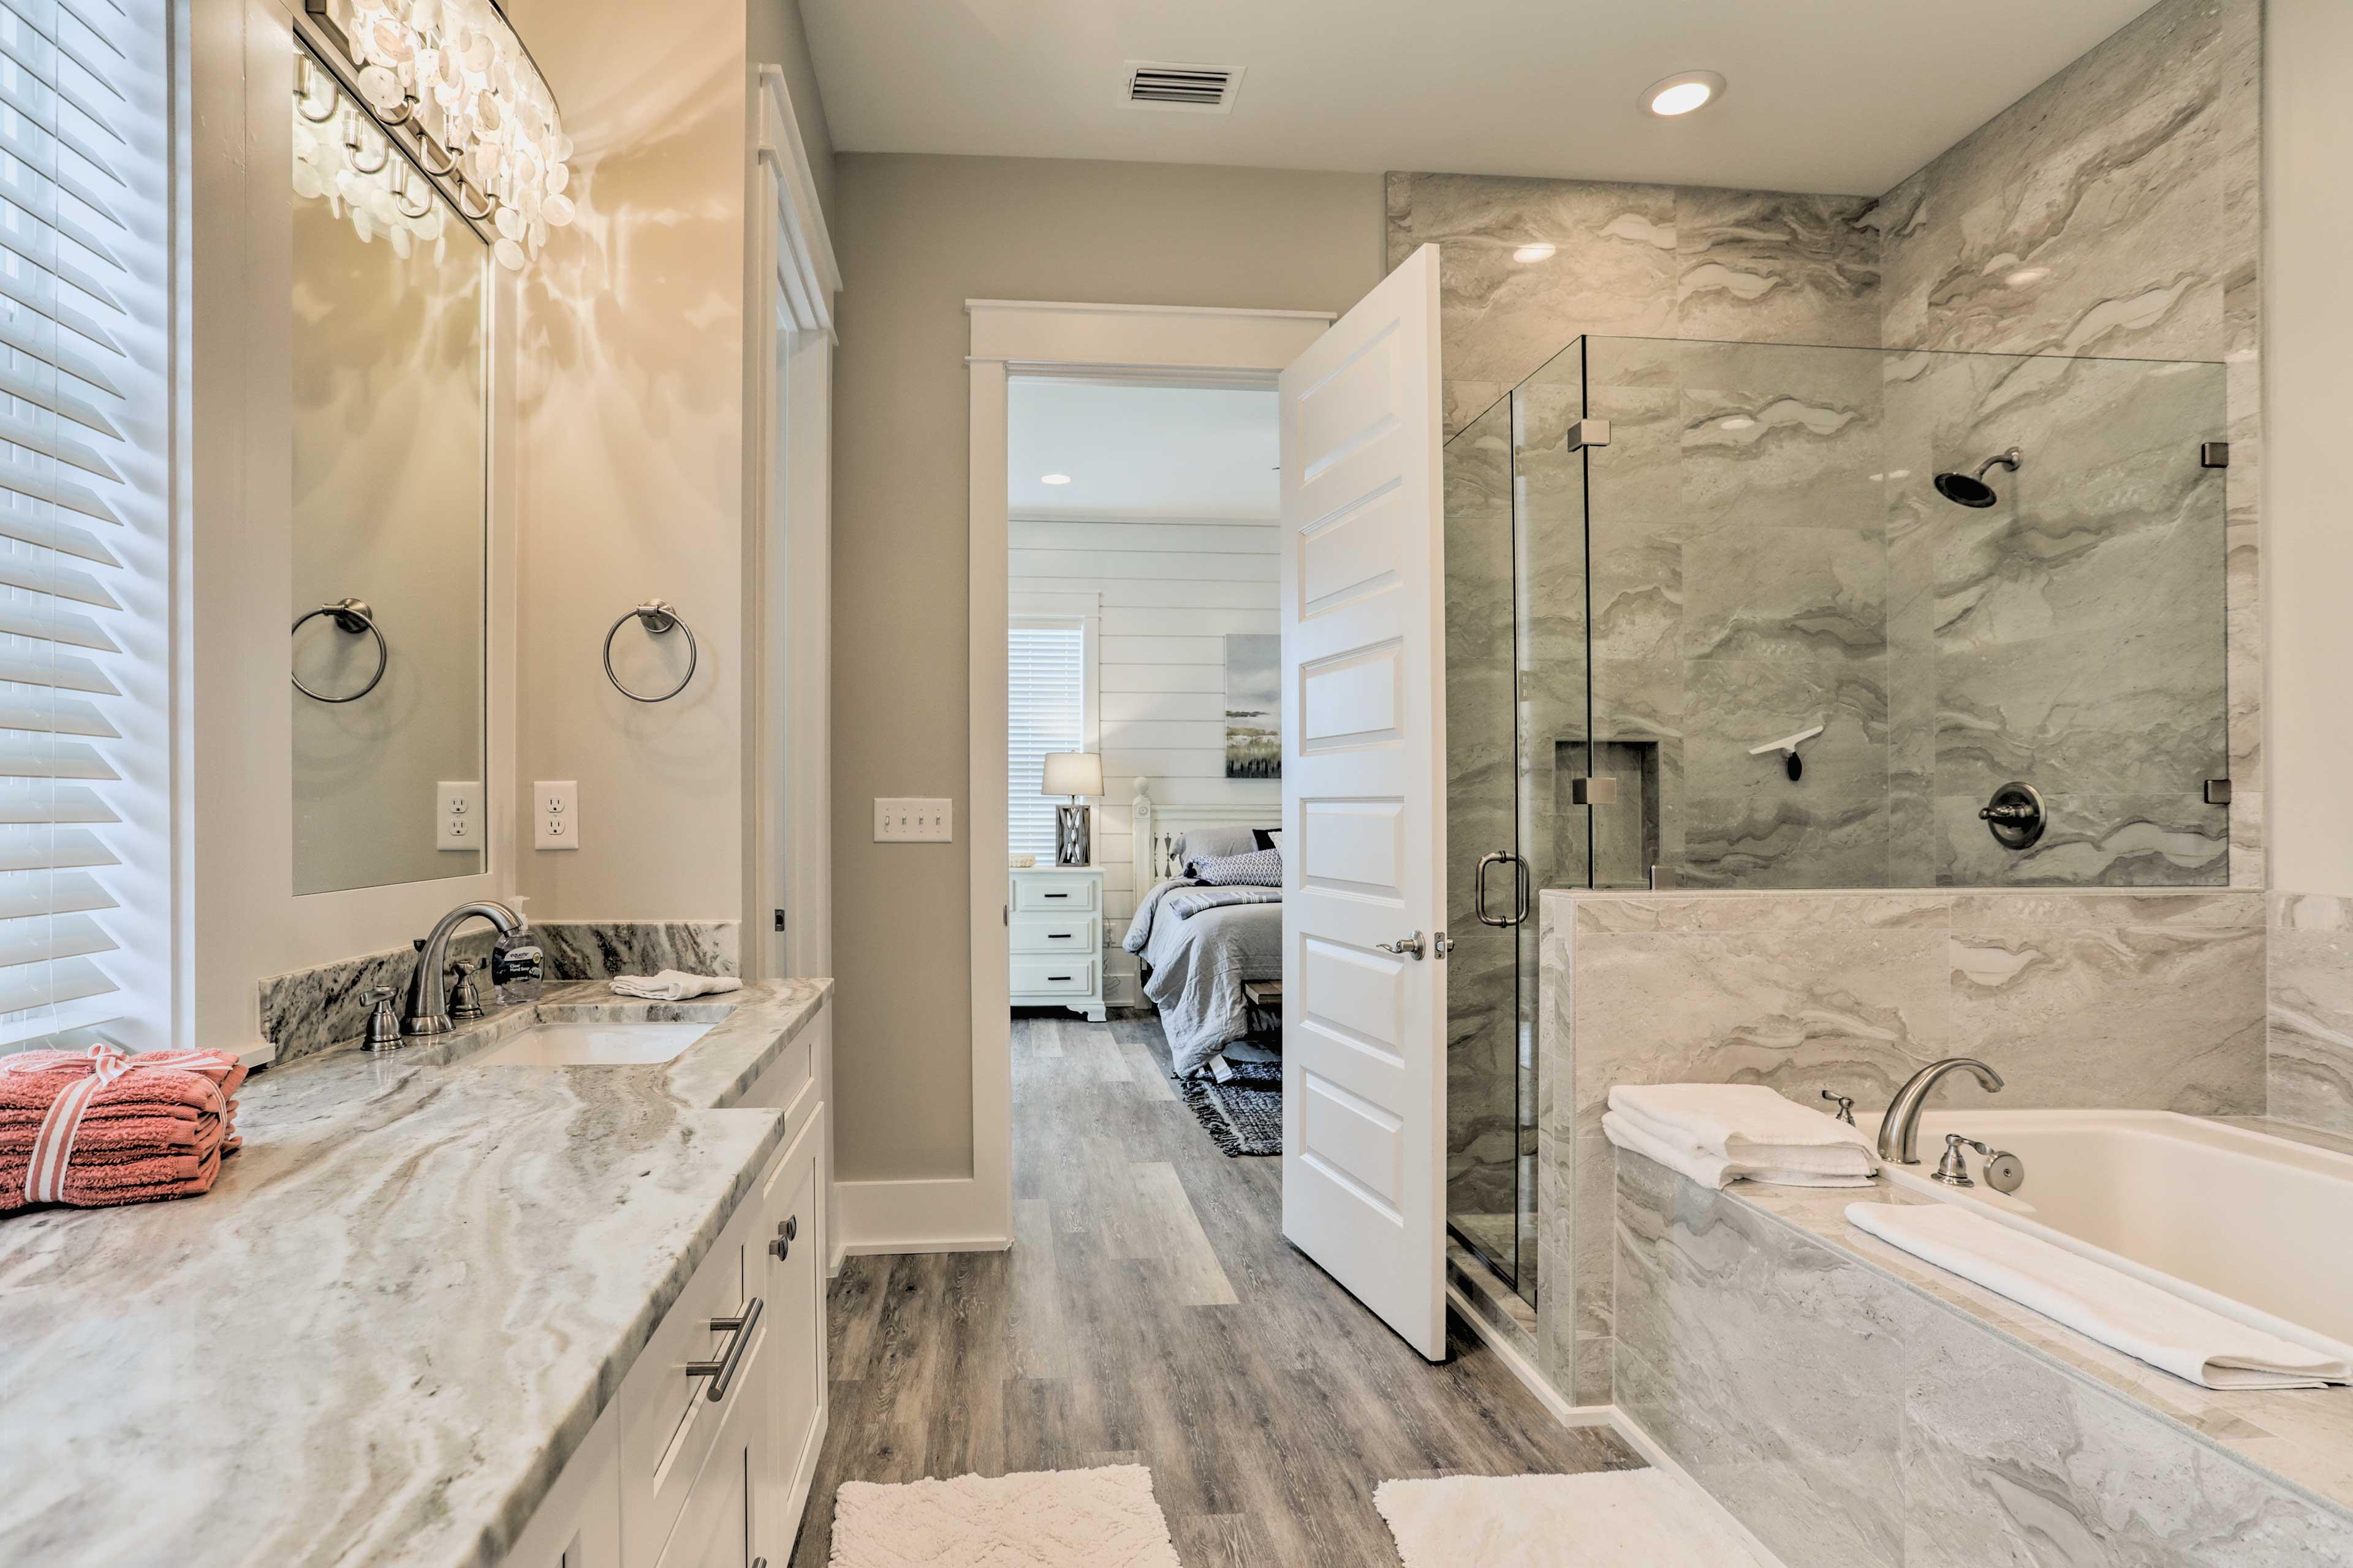 Enjoy a relaxing soak in the master bathroom tub.